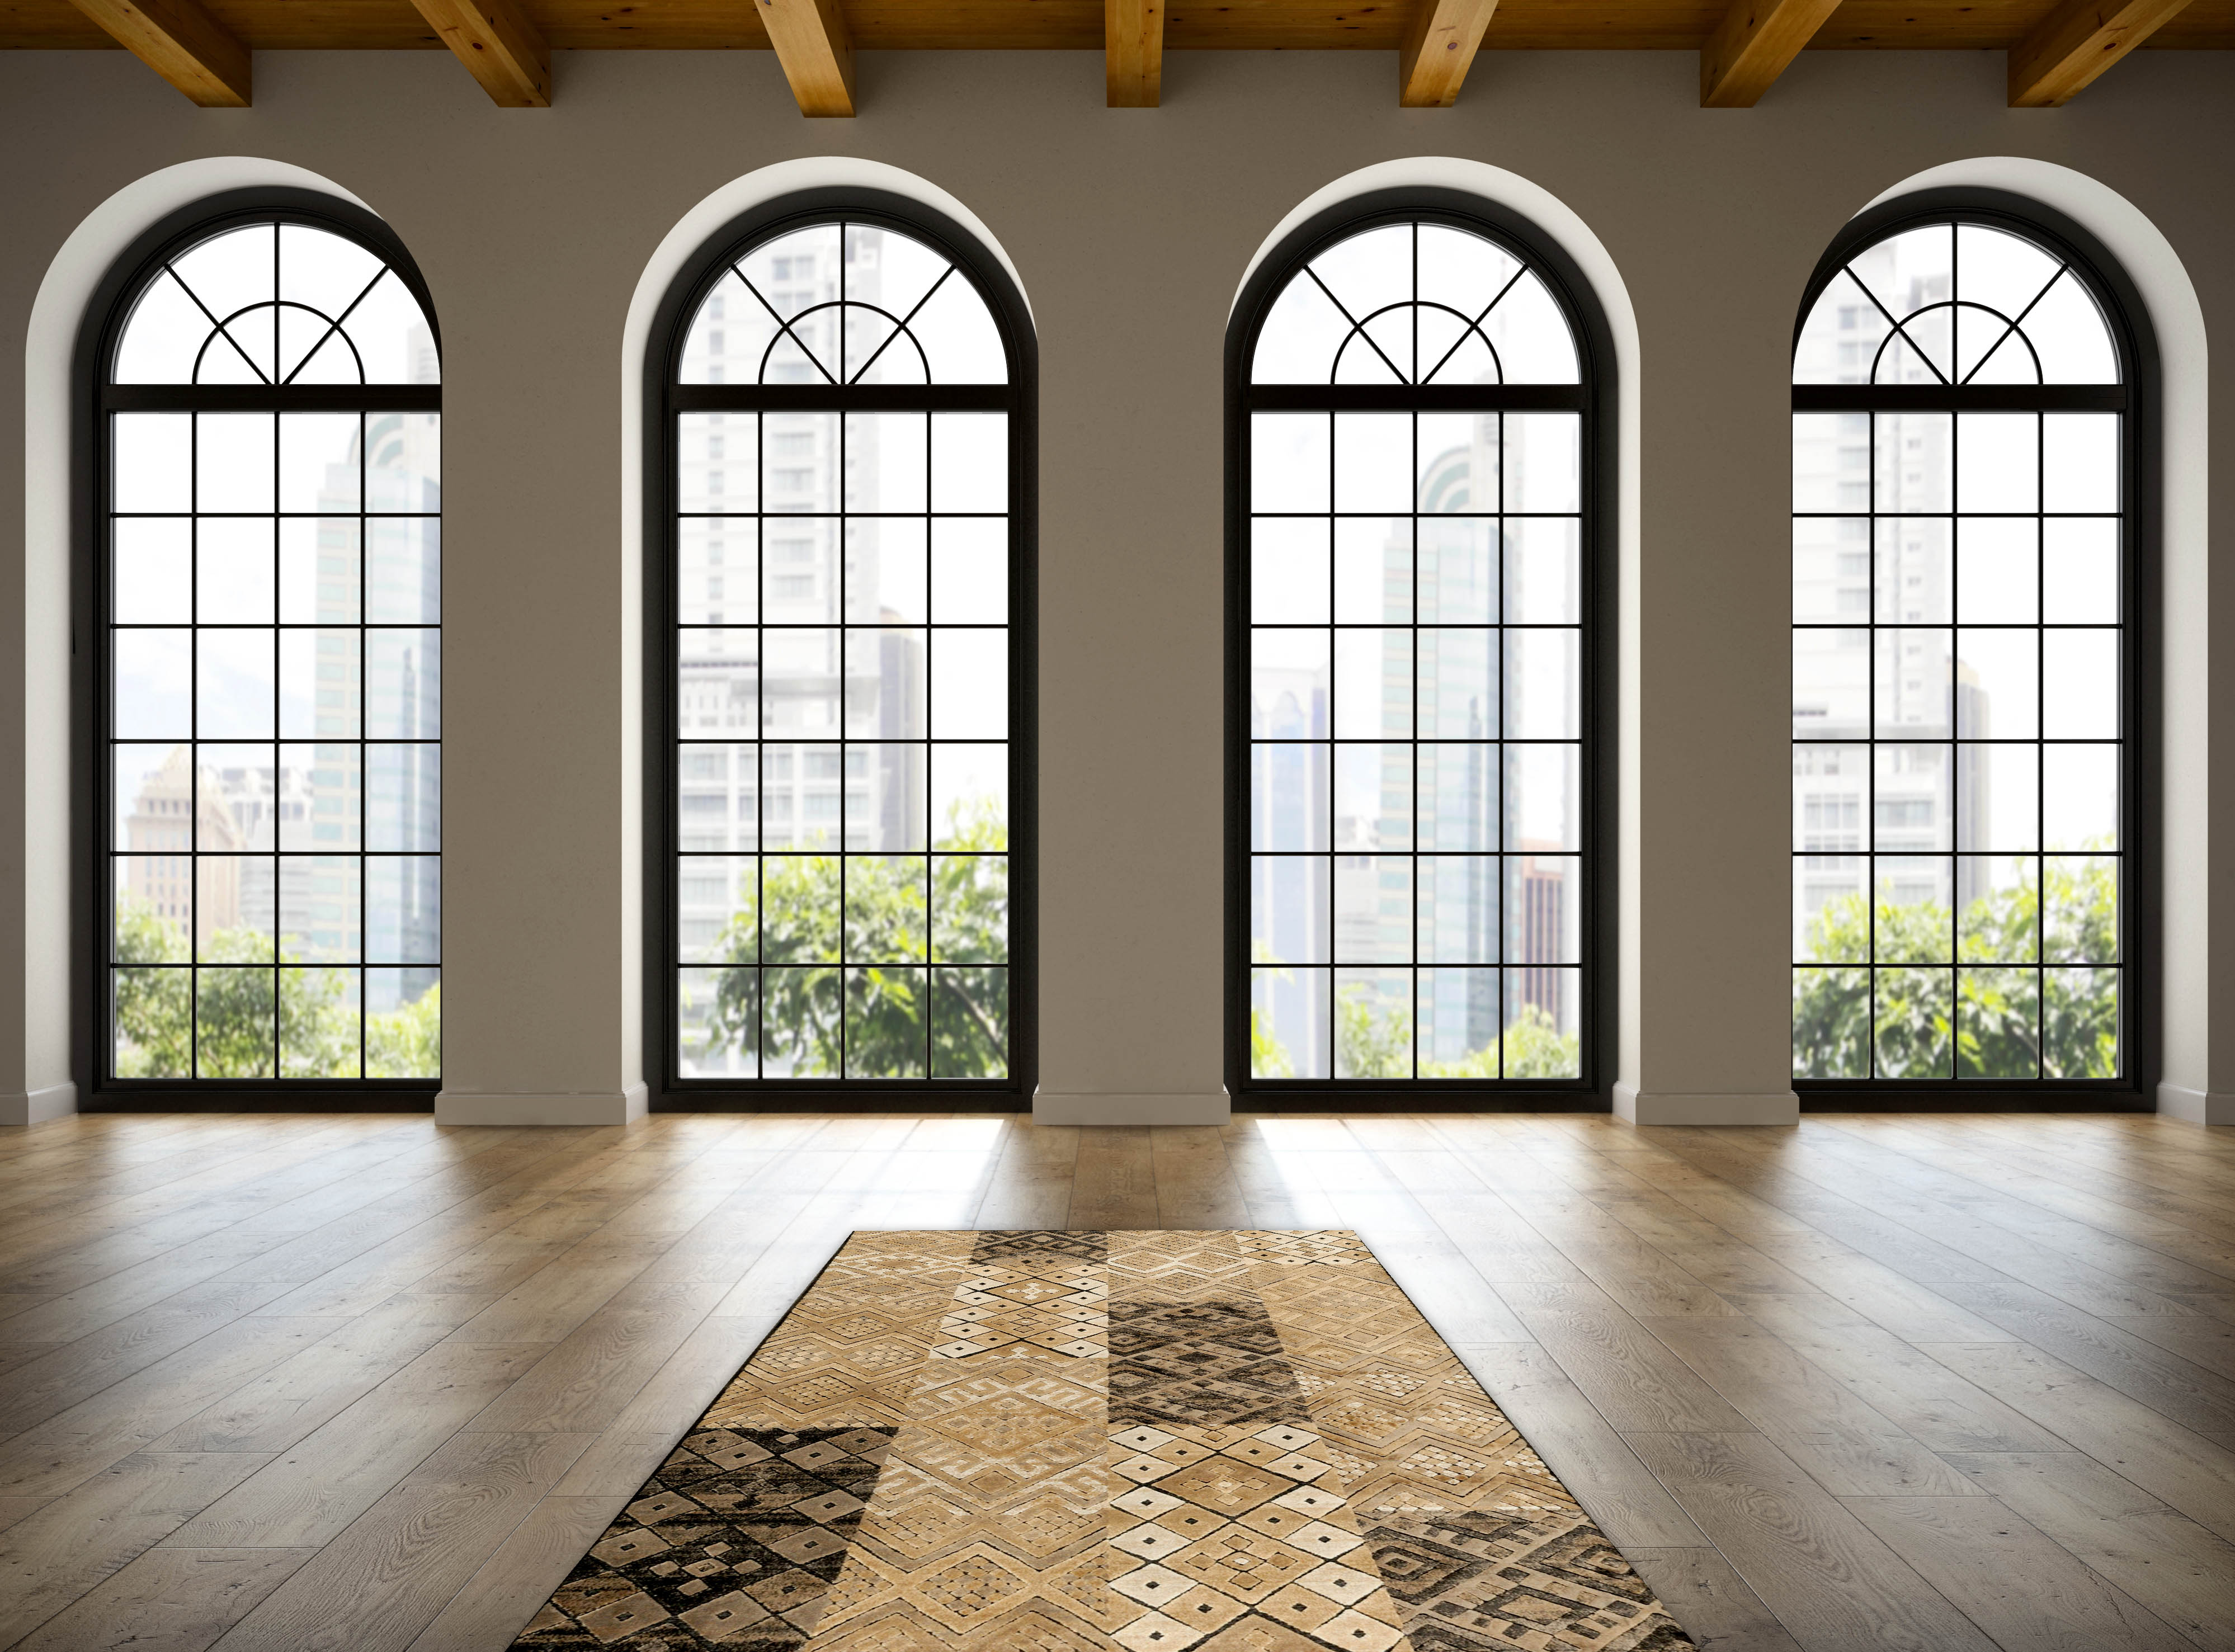 Empty loft room with arc windows 3D rendering 3